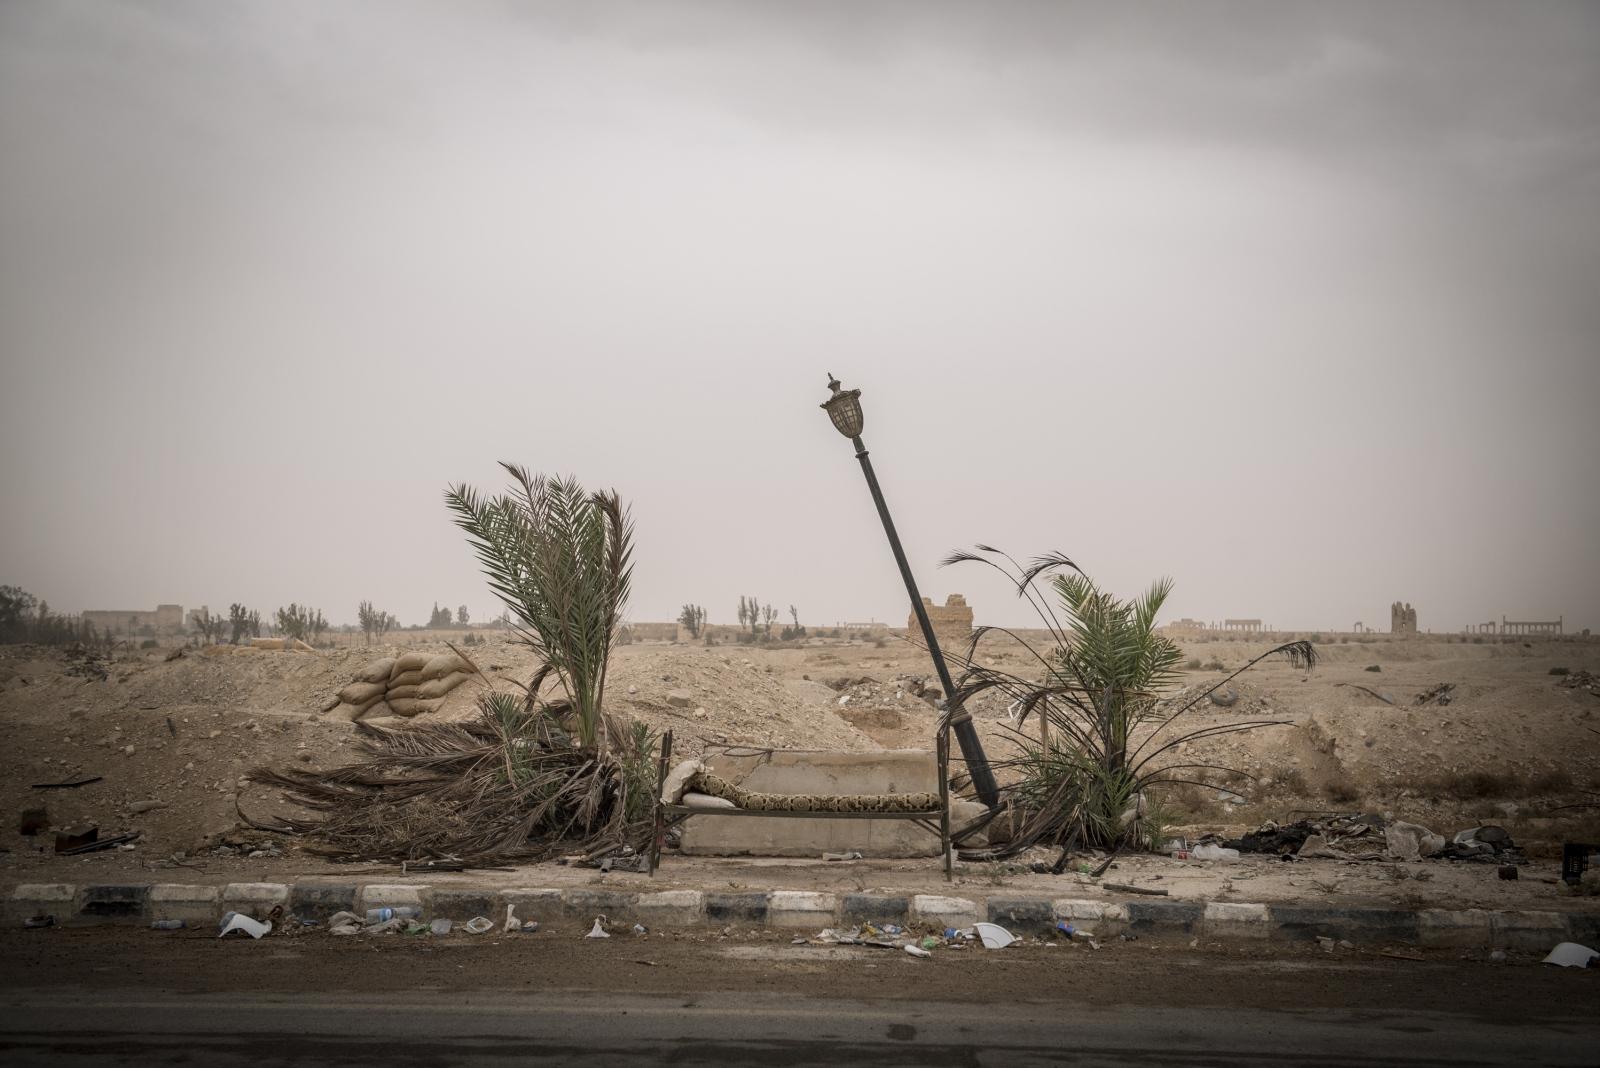 Art and Documentary Photography - Loading Cio___che_resta_di_Palmyra_03.jpg